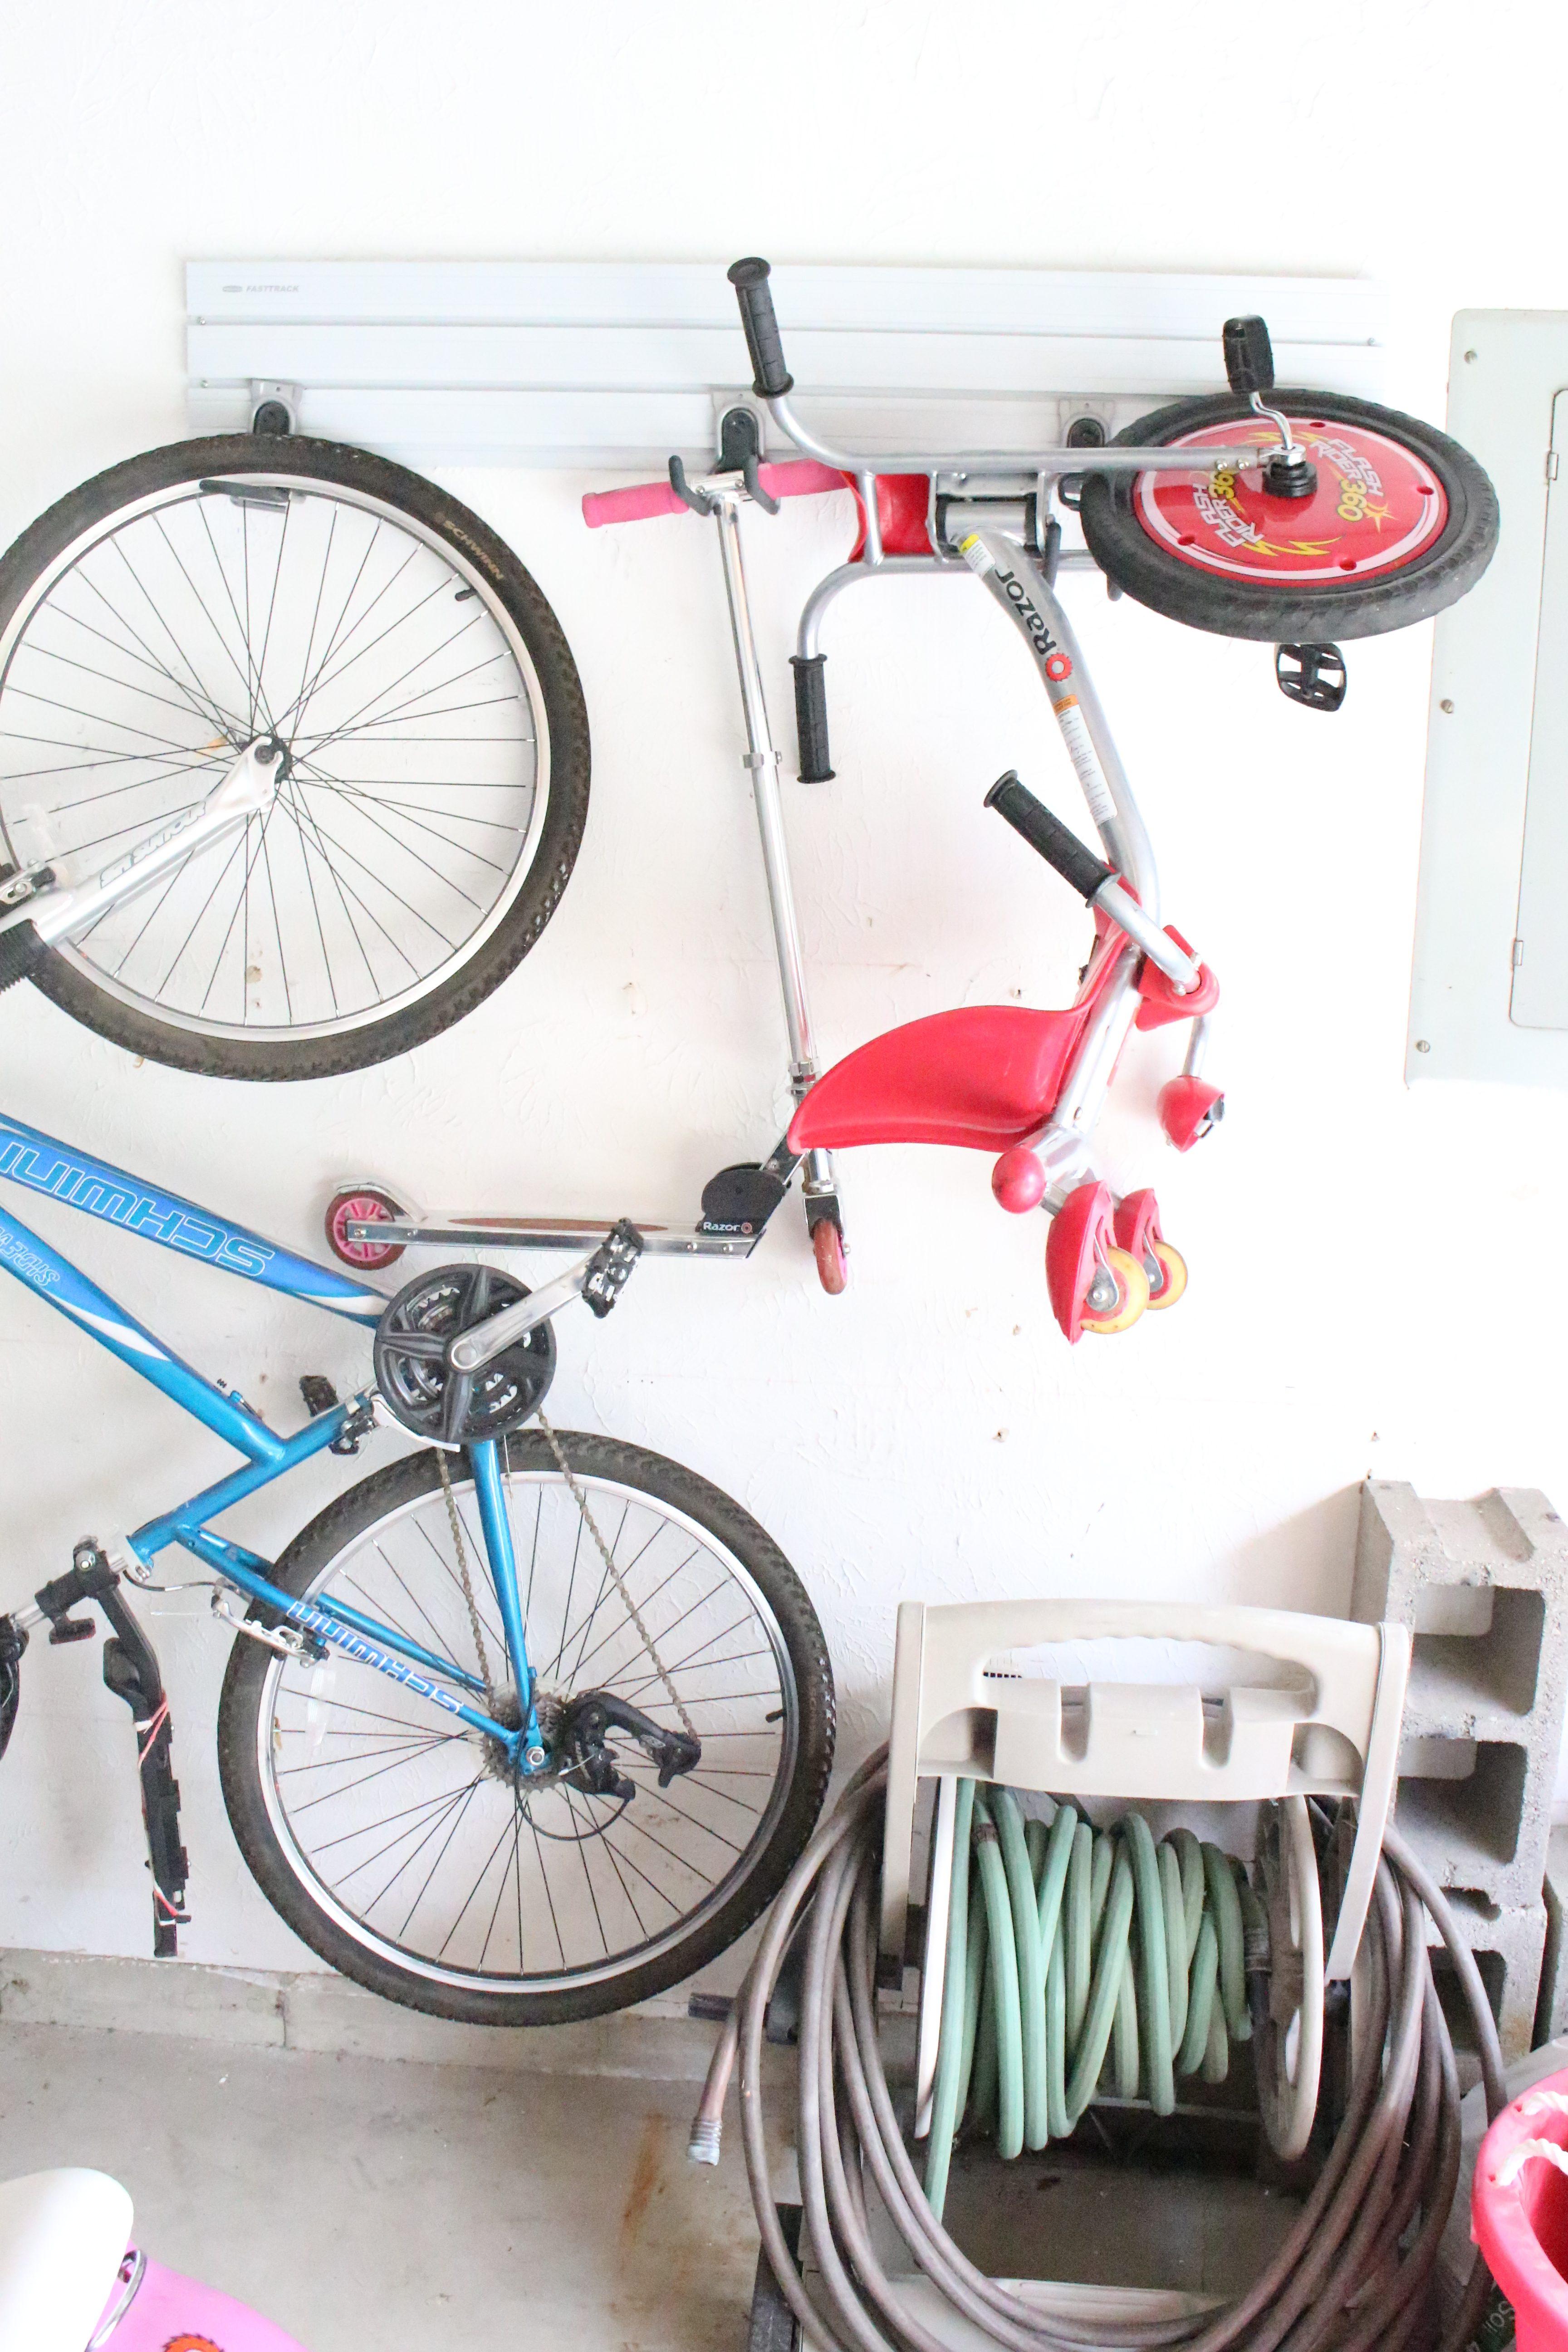 RubberMaid Fast Track Garage System |garage cleanup | Home Depot | Organizing a garage | garage system |